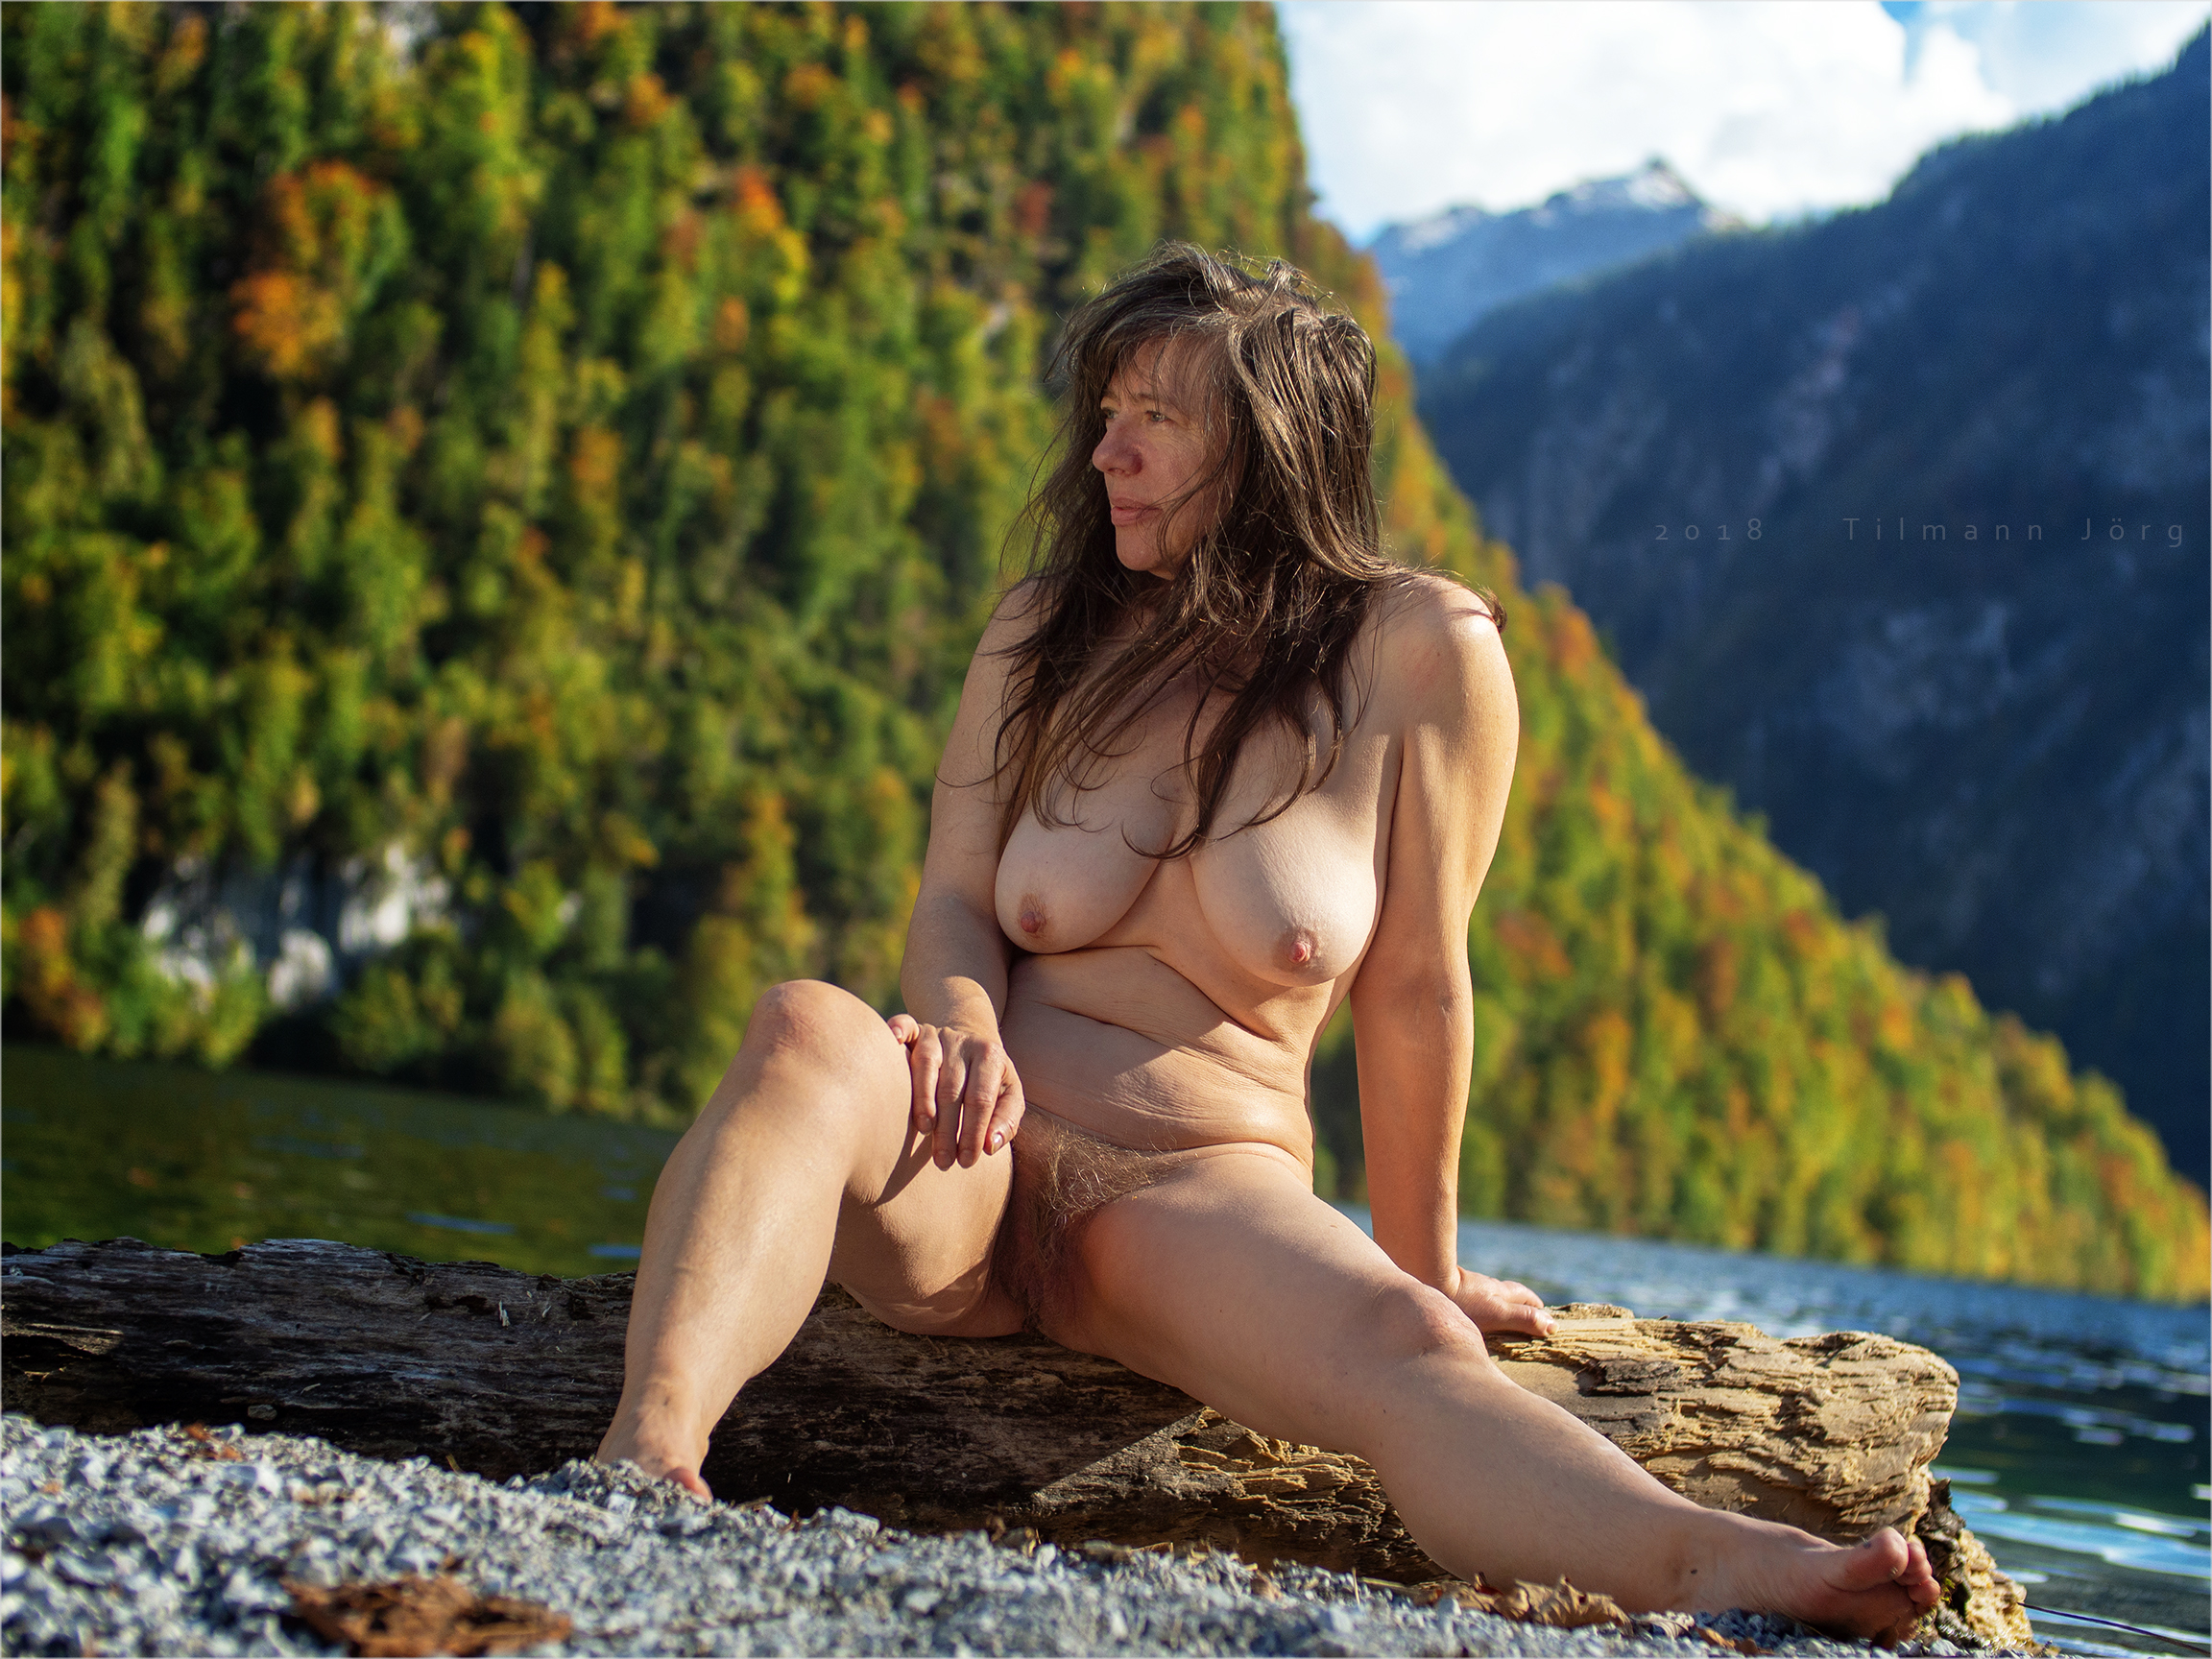 Nackte Frau Am See